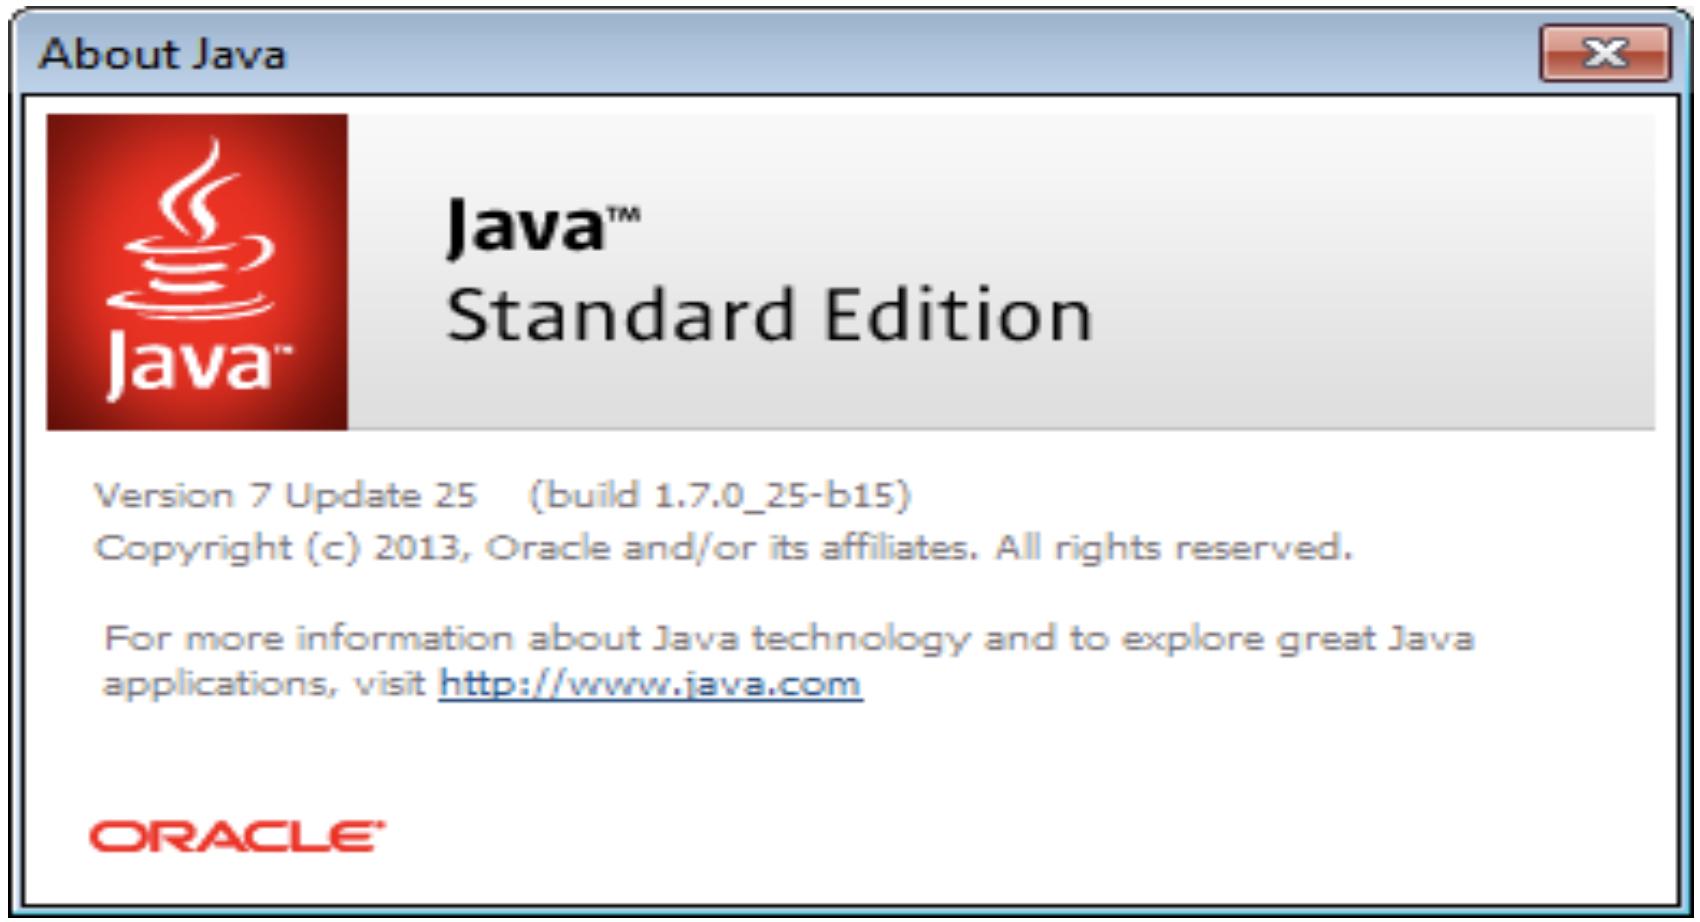 Java Version